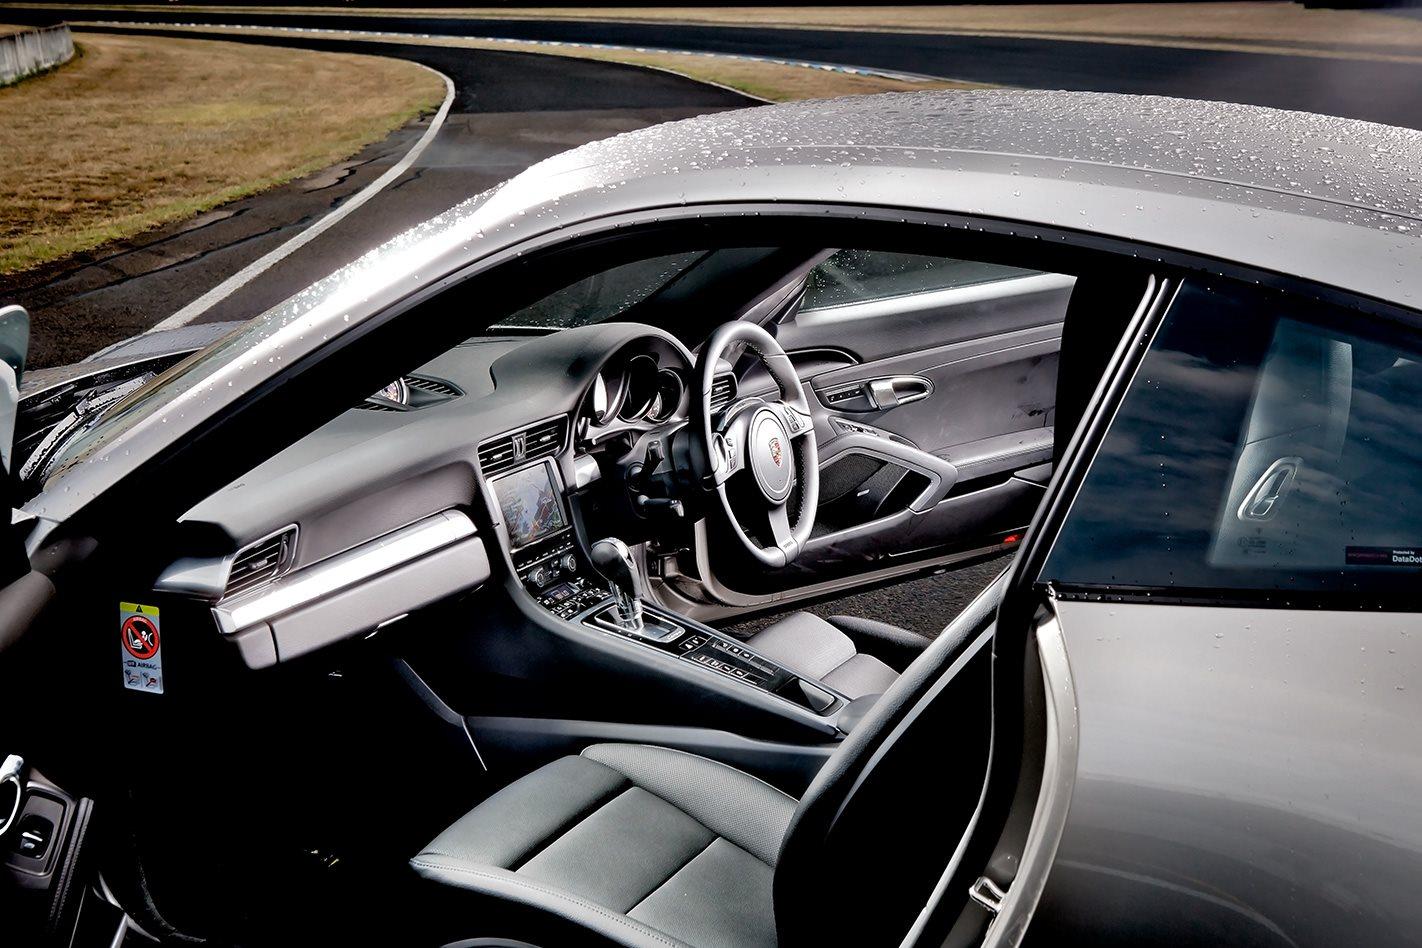 2012-Porsche-911-Carrera-S-interior.jpg